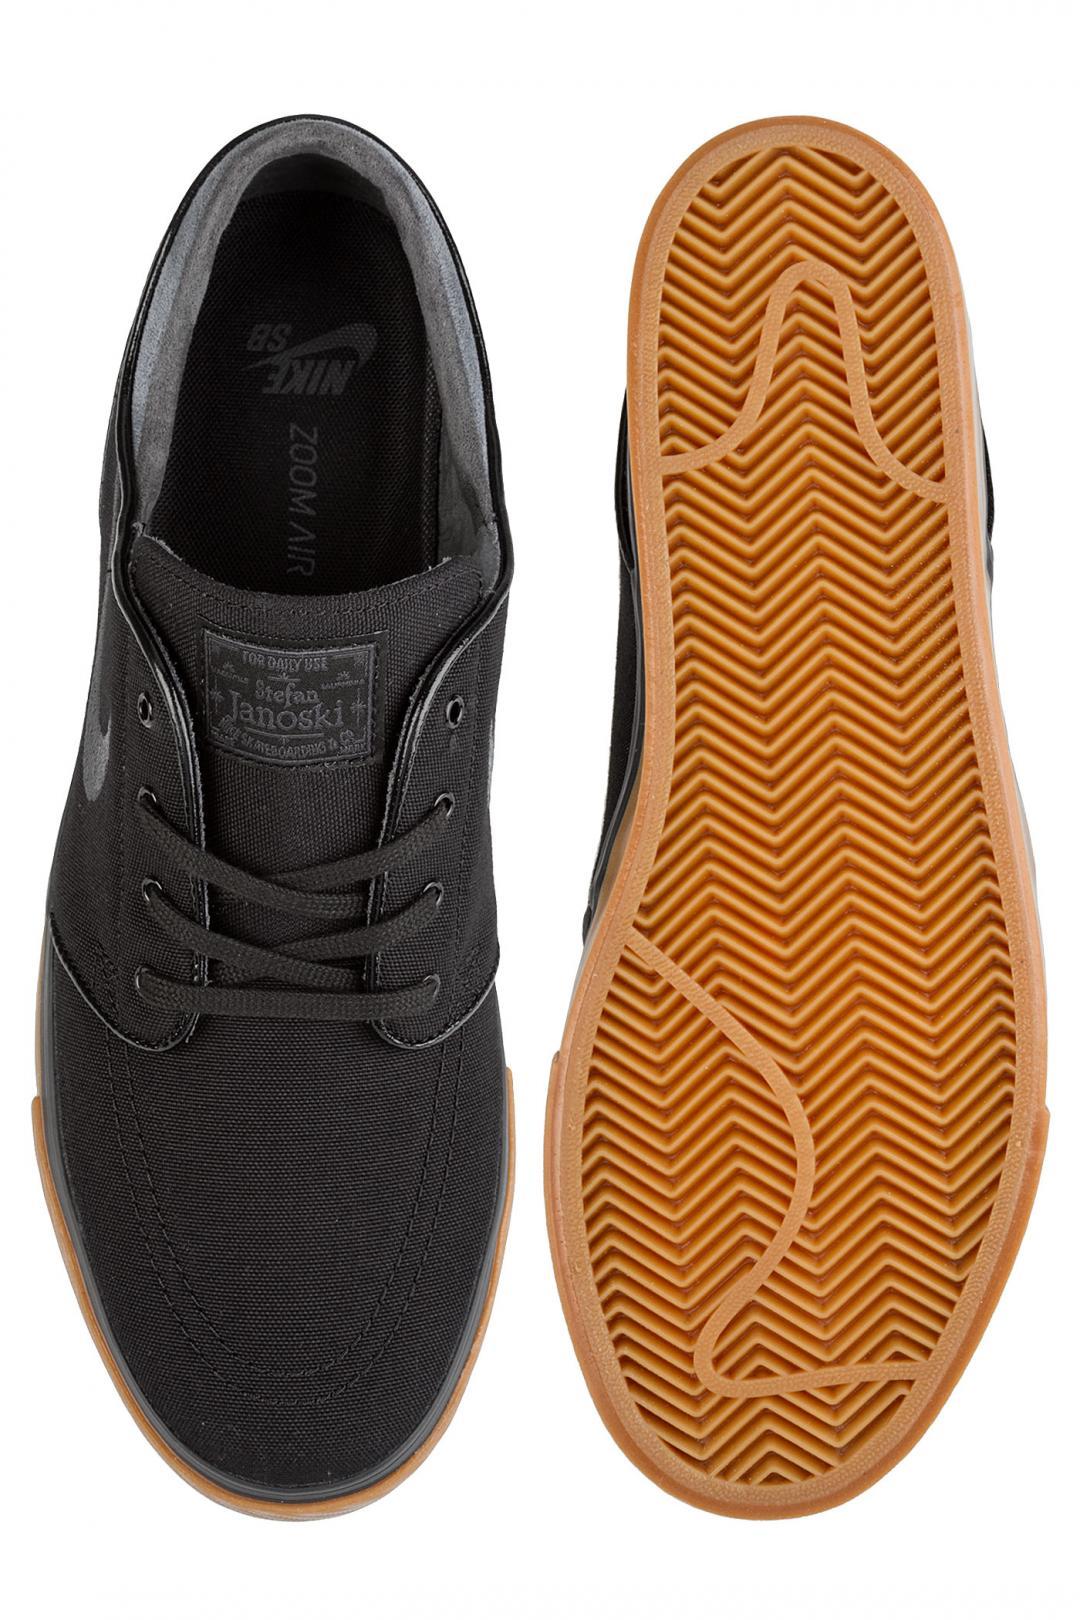 Uomo Nike SB Zoom Stefan Janoski Canvas black anthracite gum | Scarpe da skate